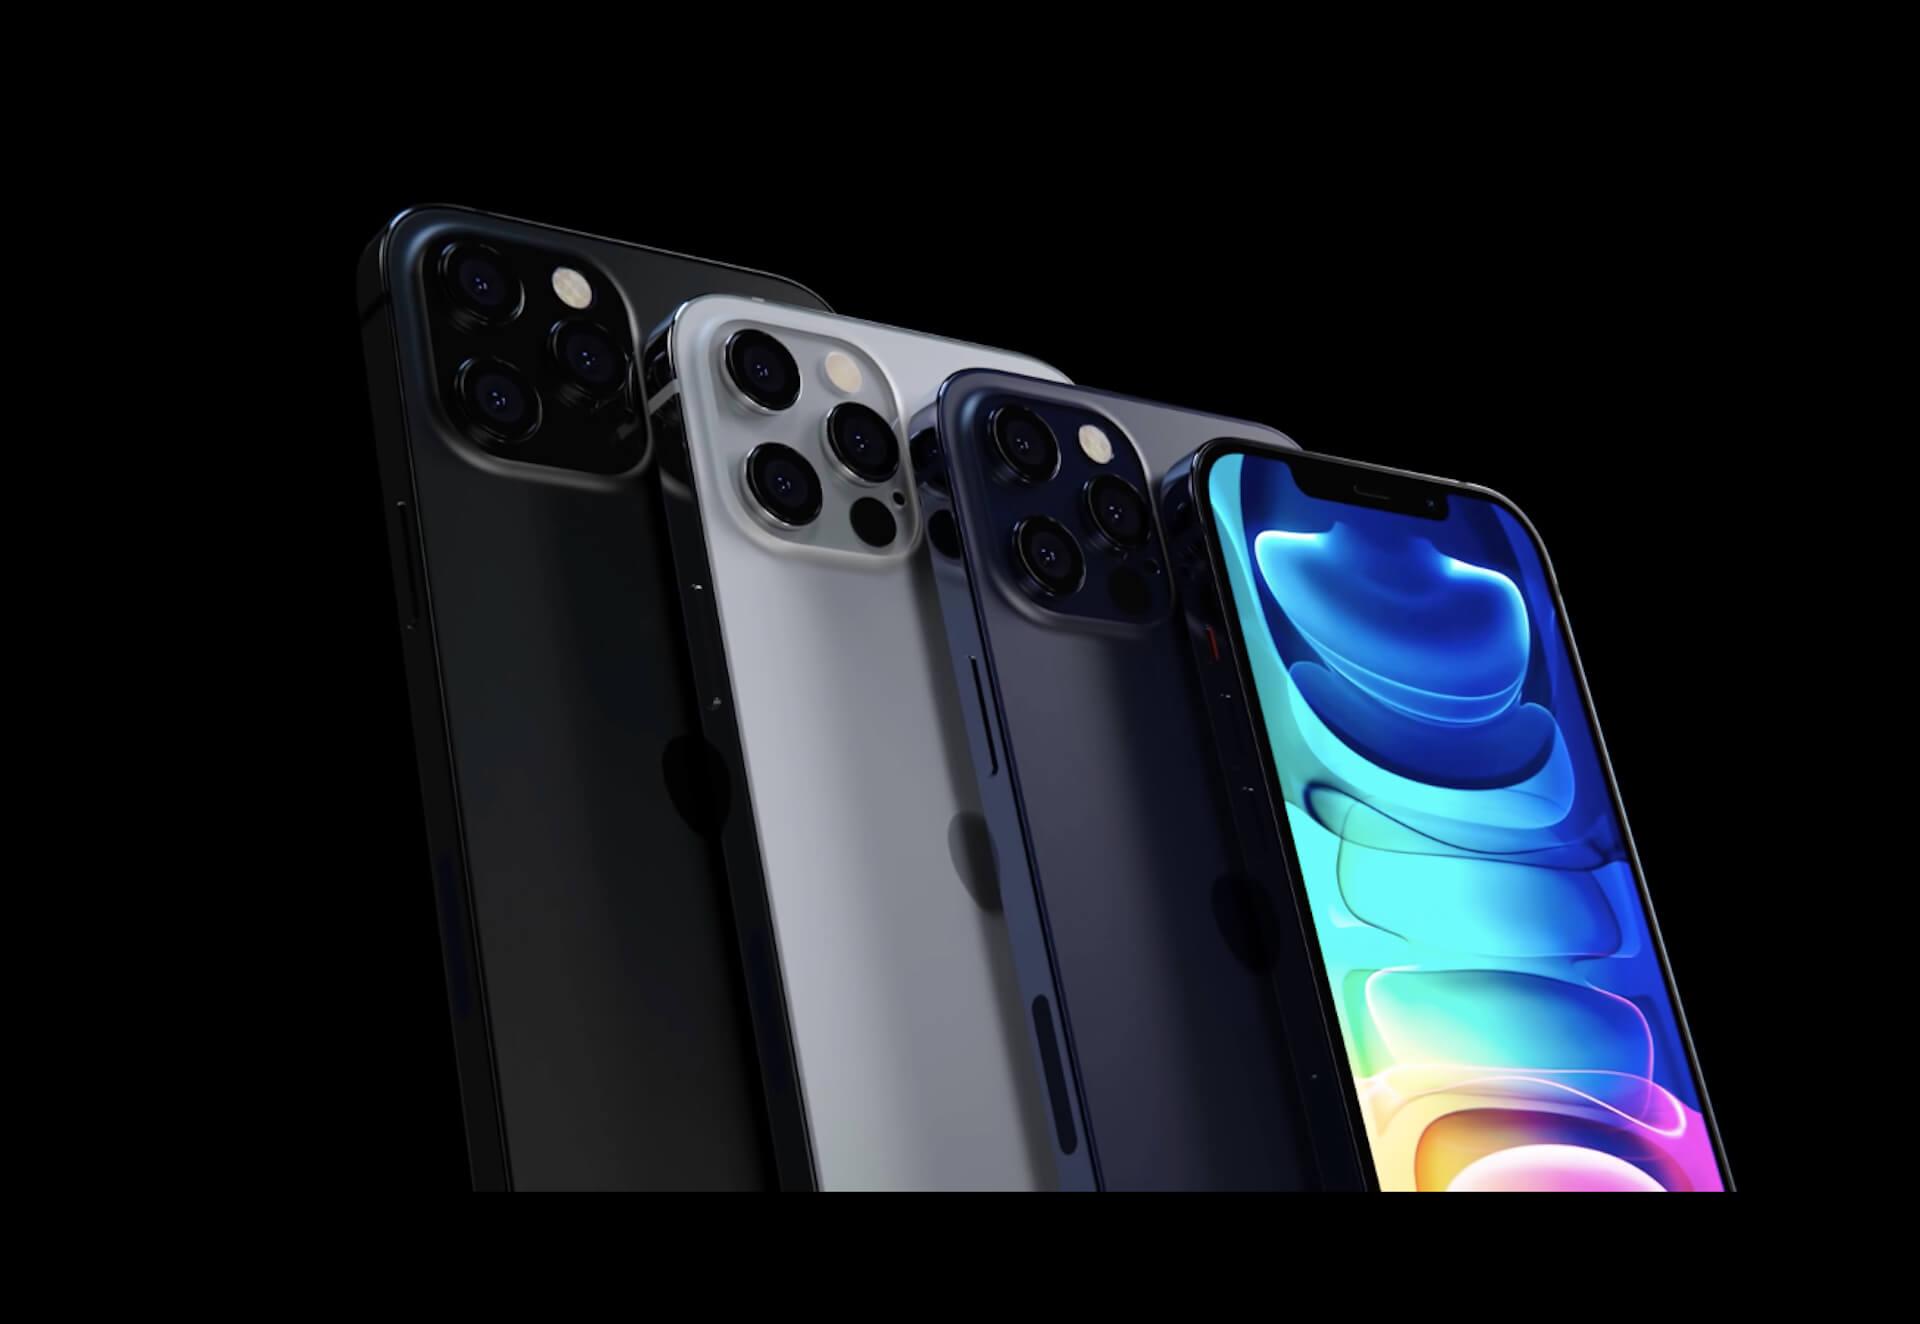 iPhone 12シリーズの発表日が目前に迫る?Appleの上級幹部がイギリスの携帯キャリアの会合に登場か tech200923_iphone12_launch_main